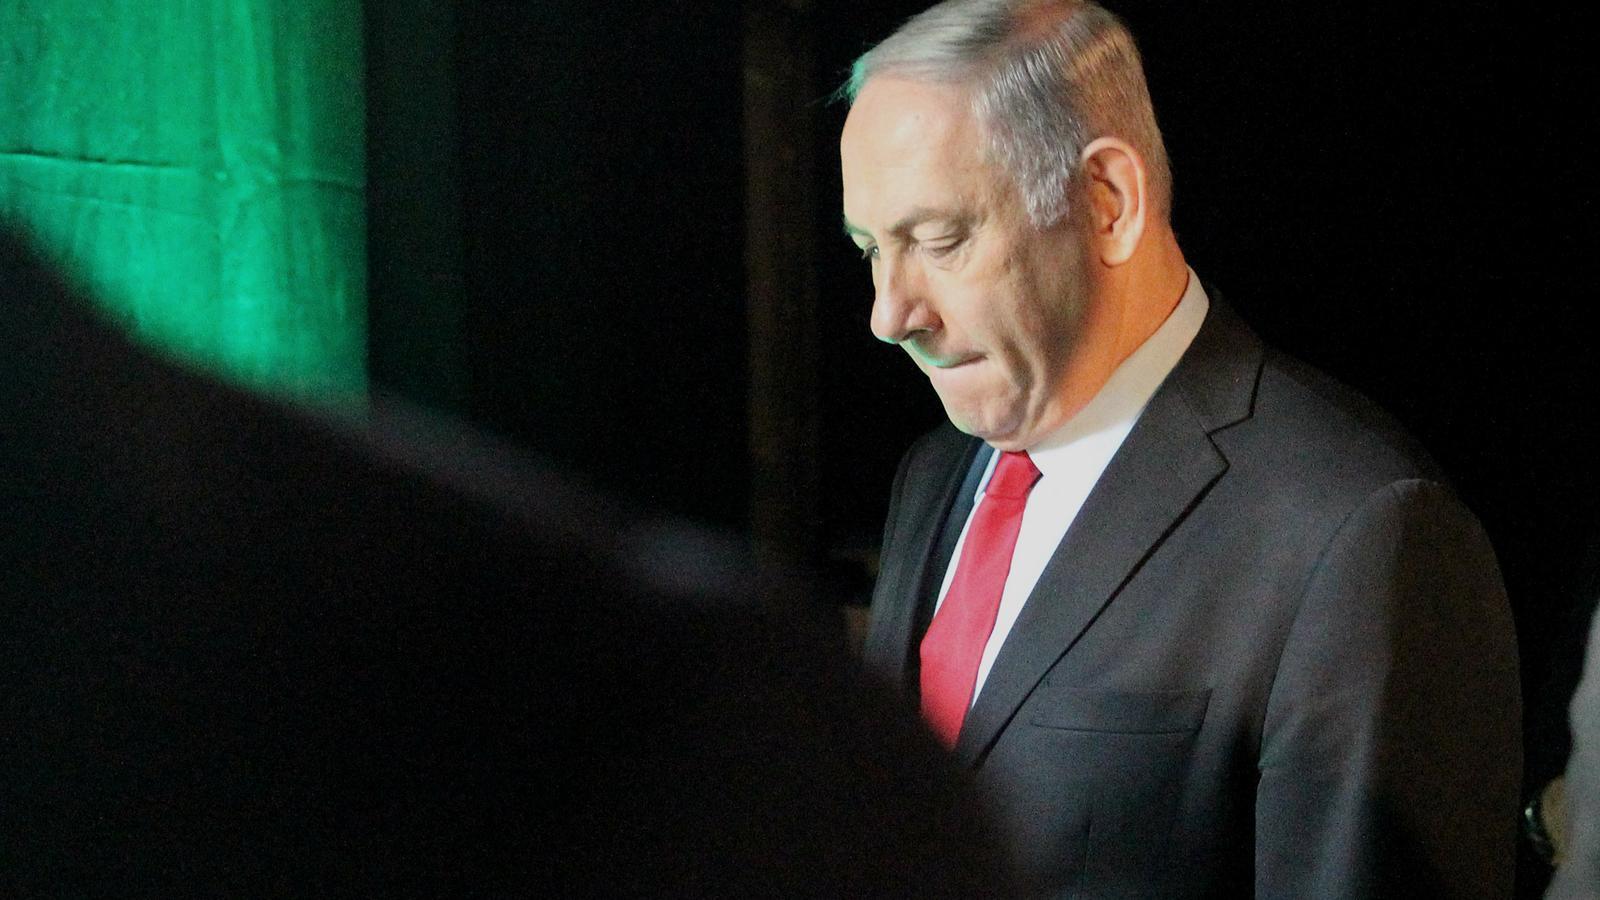 Netanyahu serà jutjat per suborn i frau